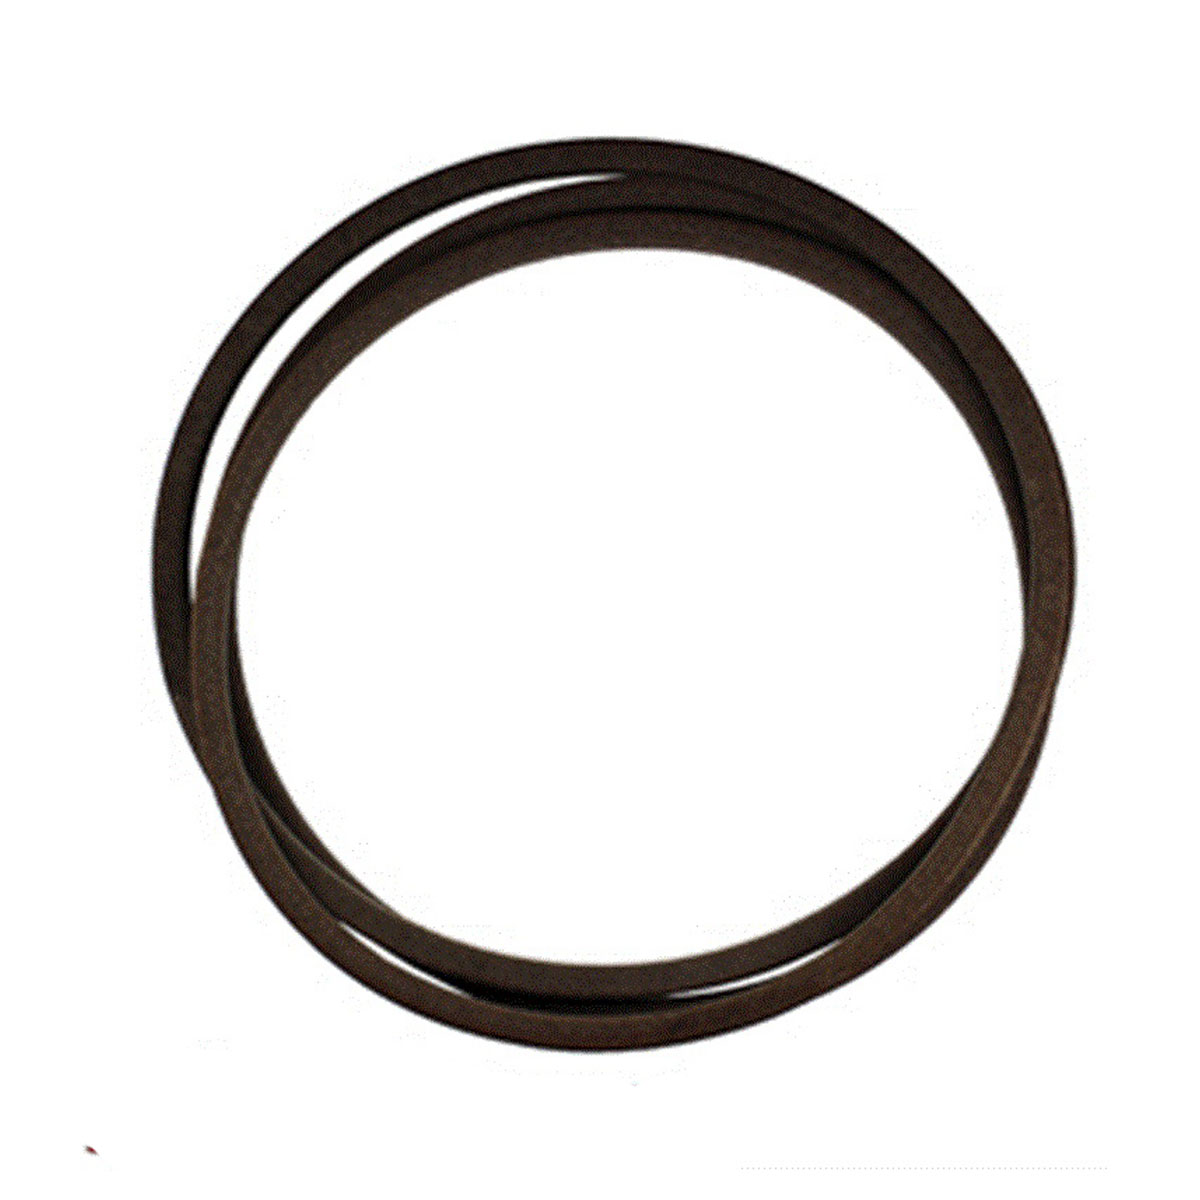 Simplicity V-Belt HA 094 50 LG 1726841SM | Power Mower Sales